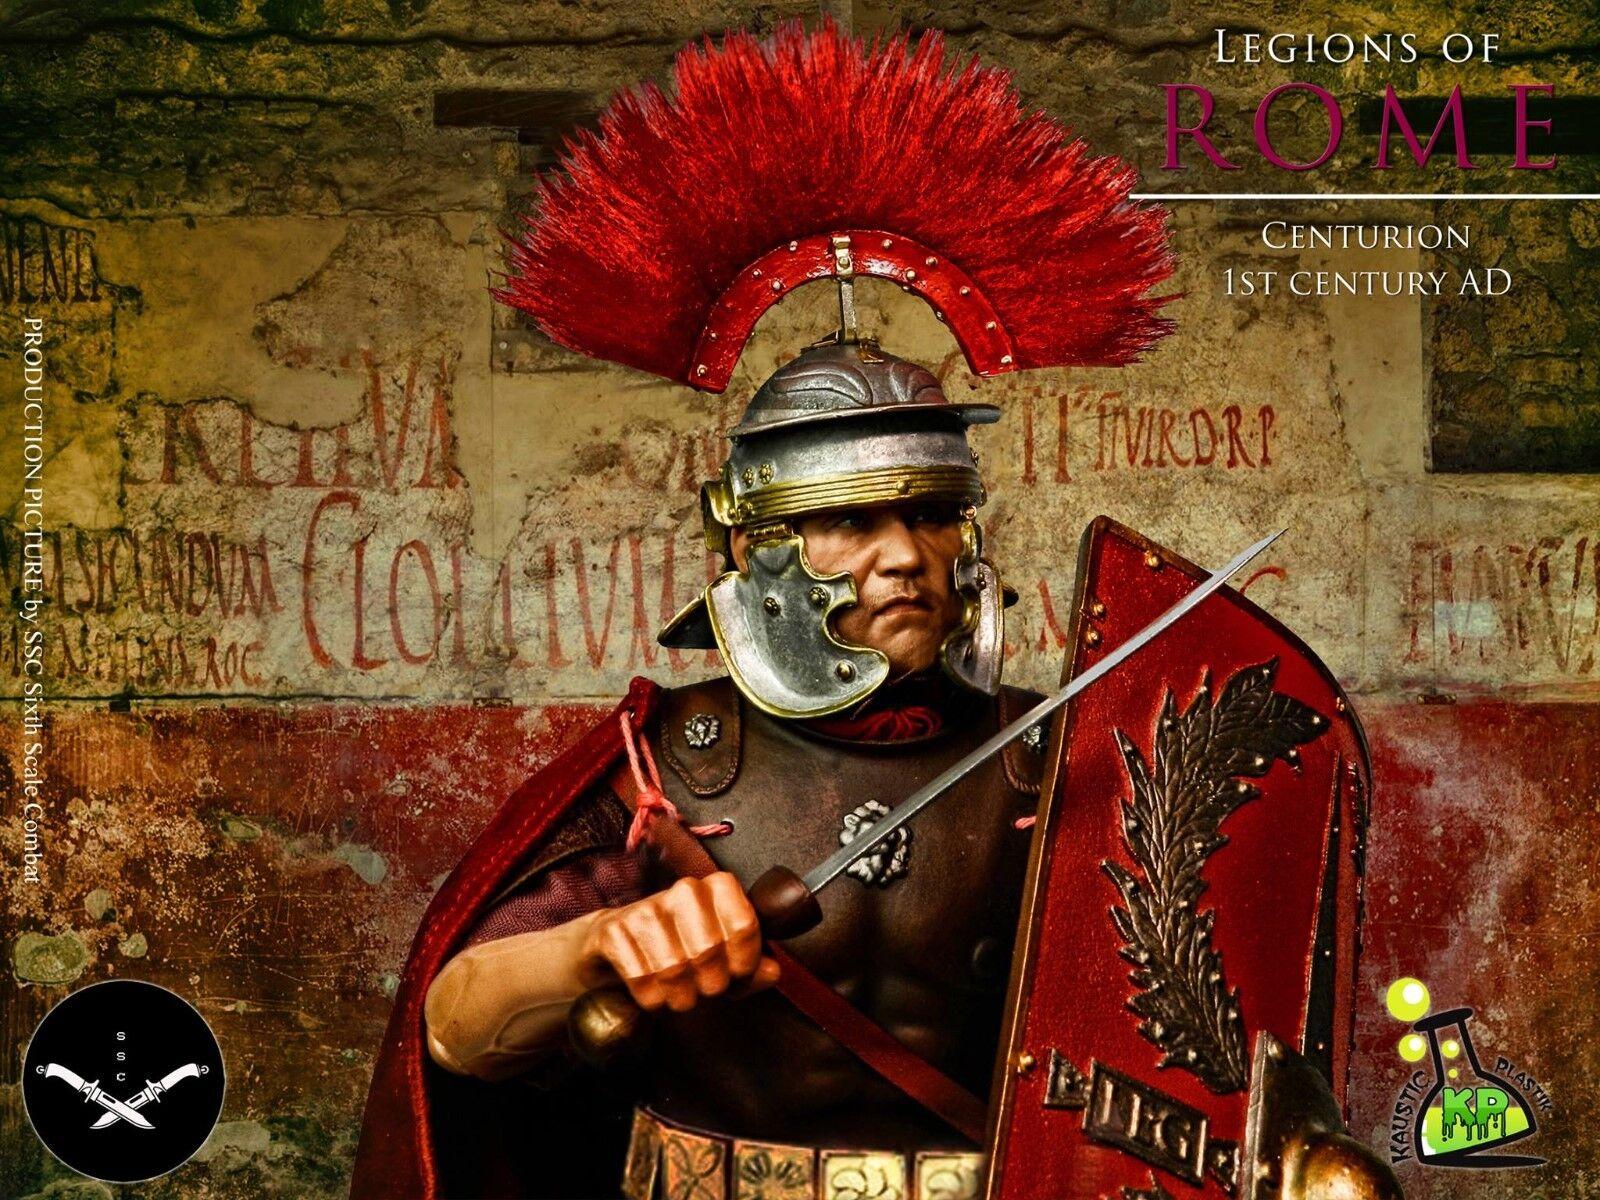 KAUSTIC PLASTIK KP14 Centurion - First Century A.D